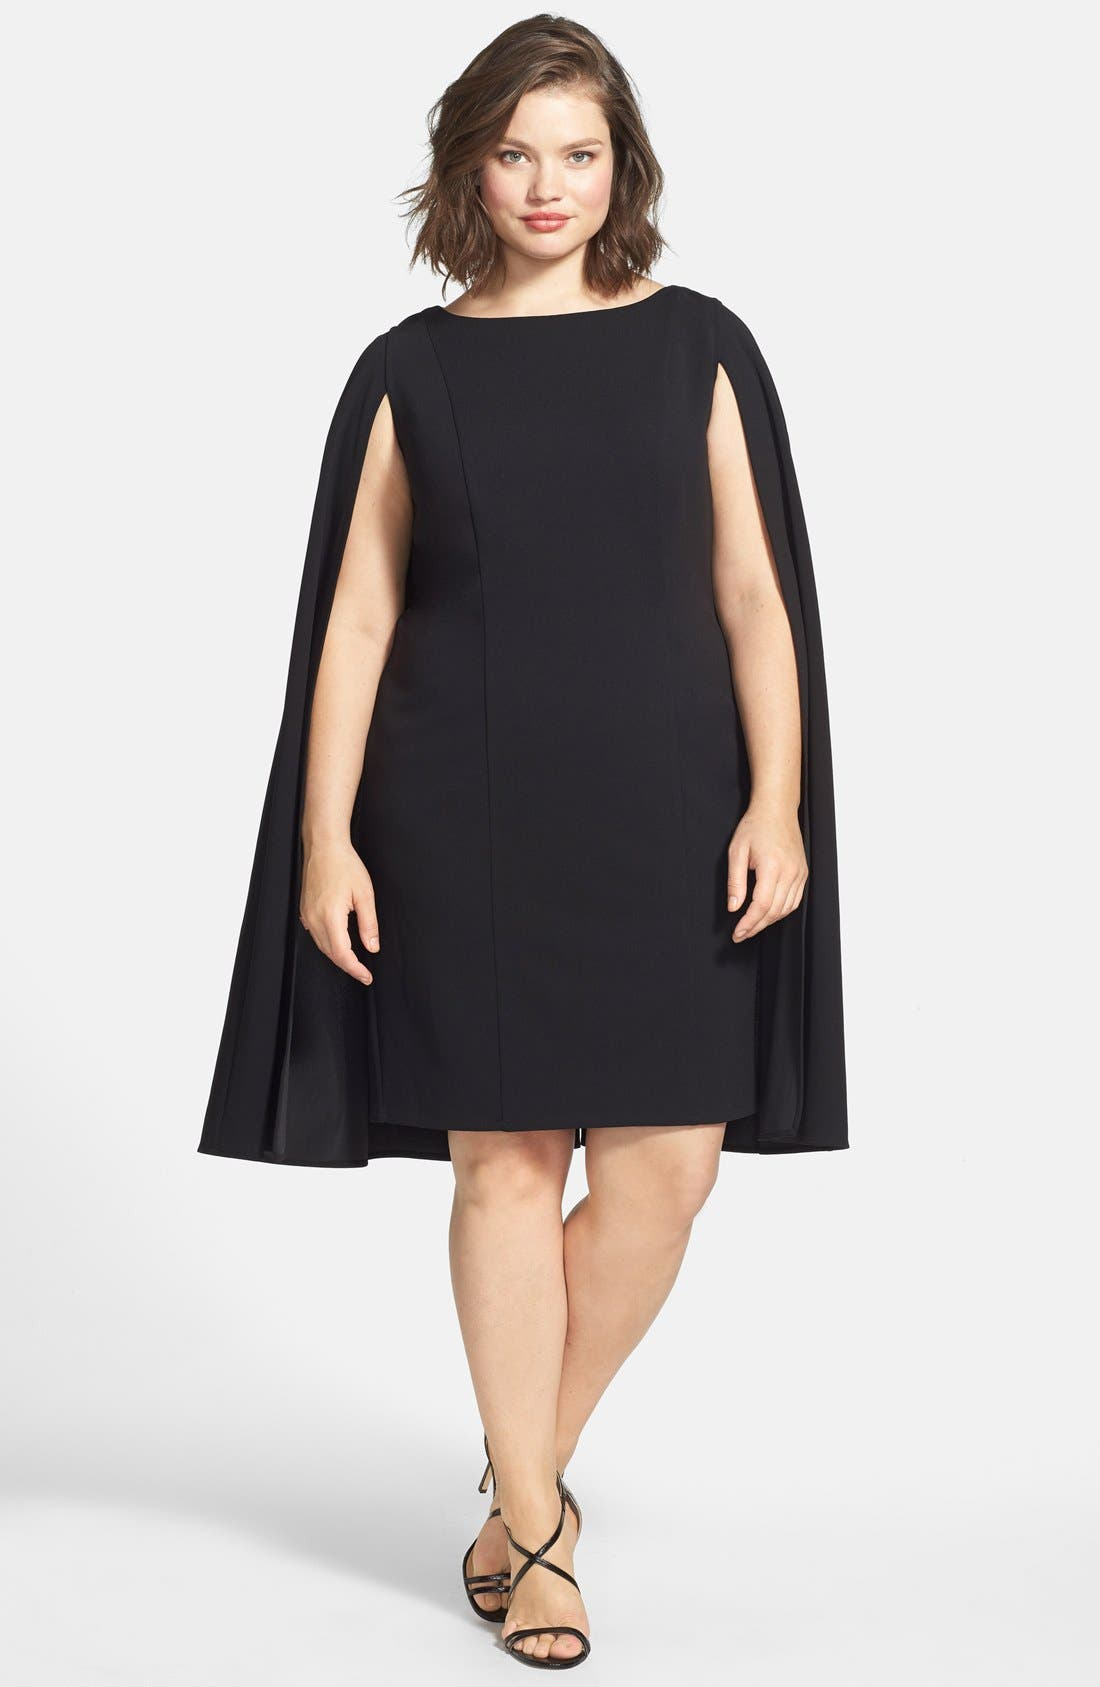 Cape Sheath Dress,                             Alternate thumbnail 11, color,                             001